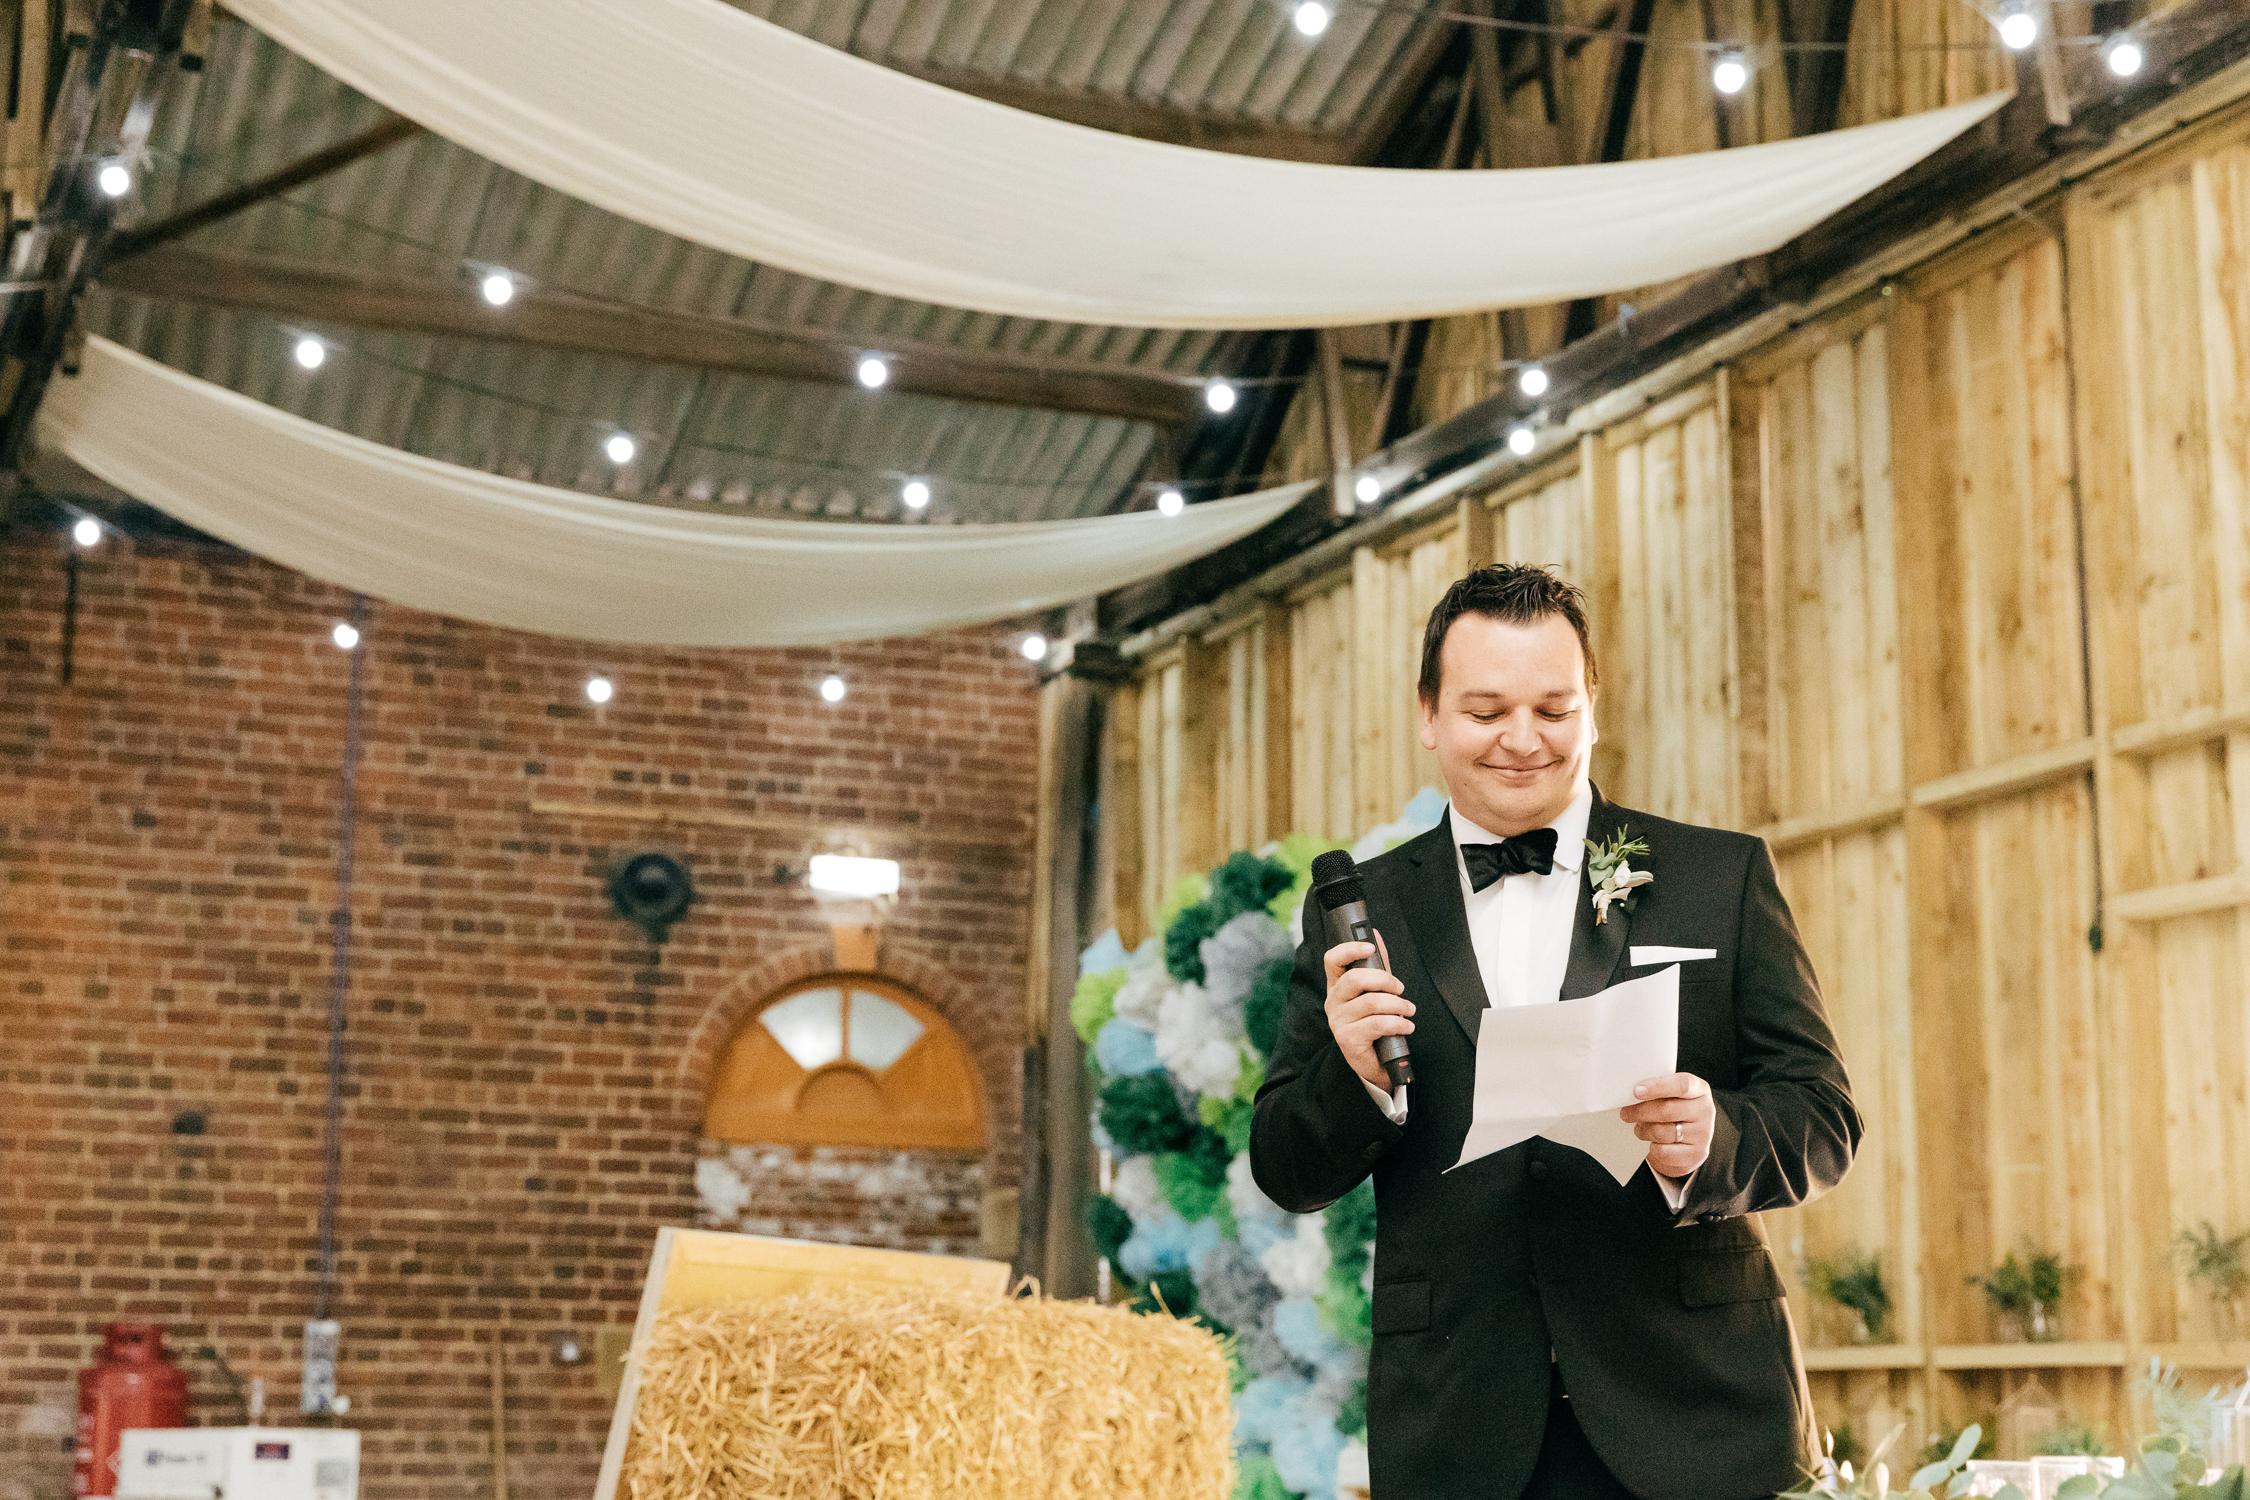 documentary wedding photographer captures speeches at DIY barn wedding